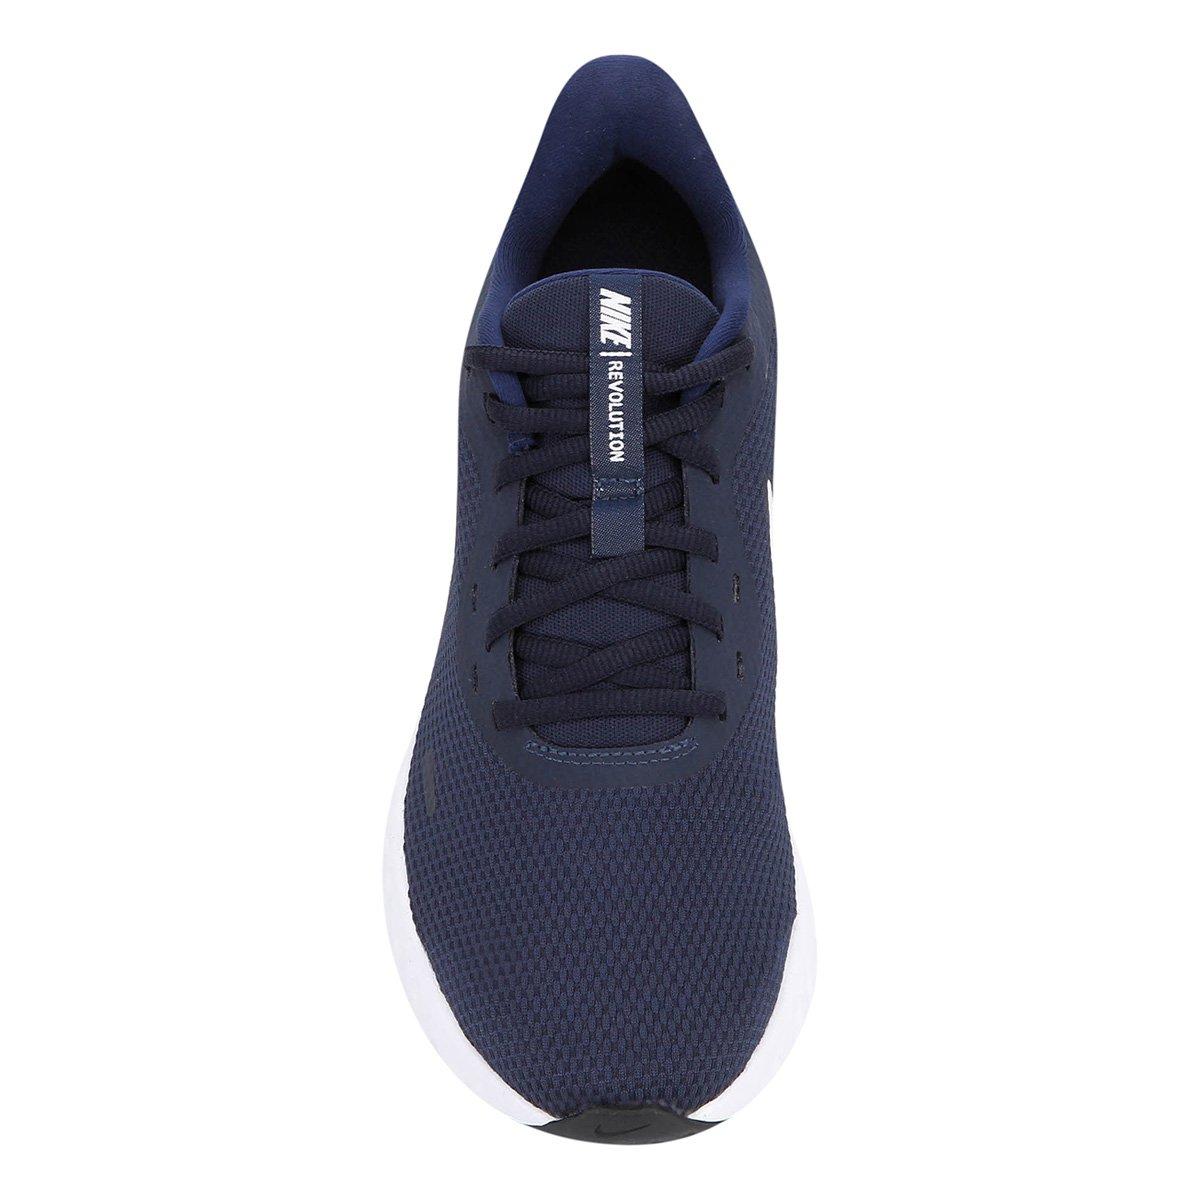 Tênis Nike Revolution 5 Masculino - Tam: 39 - 2